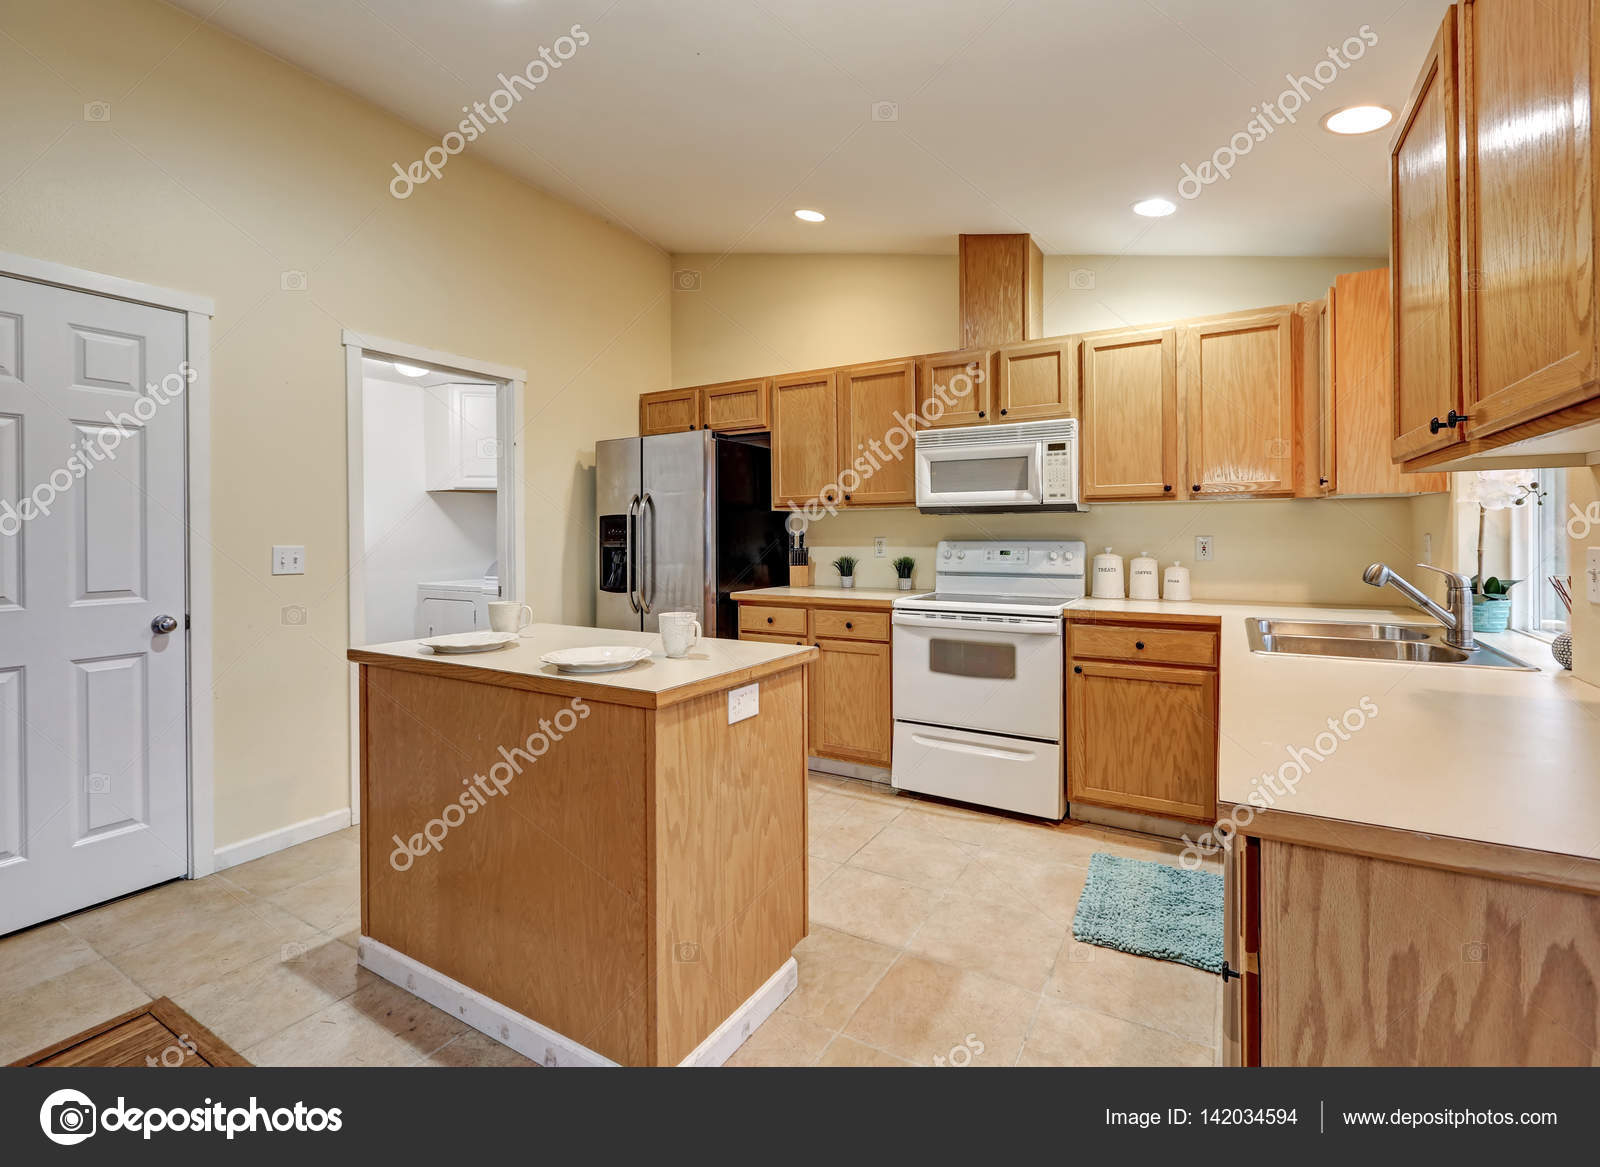 Licht open concept keuken kamer met gewelfde plafond u stockfoto